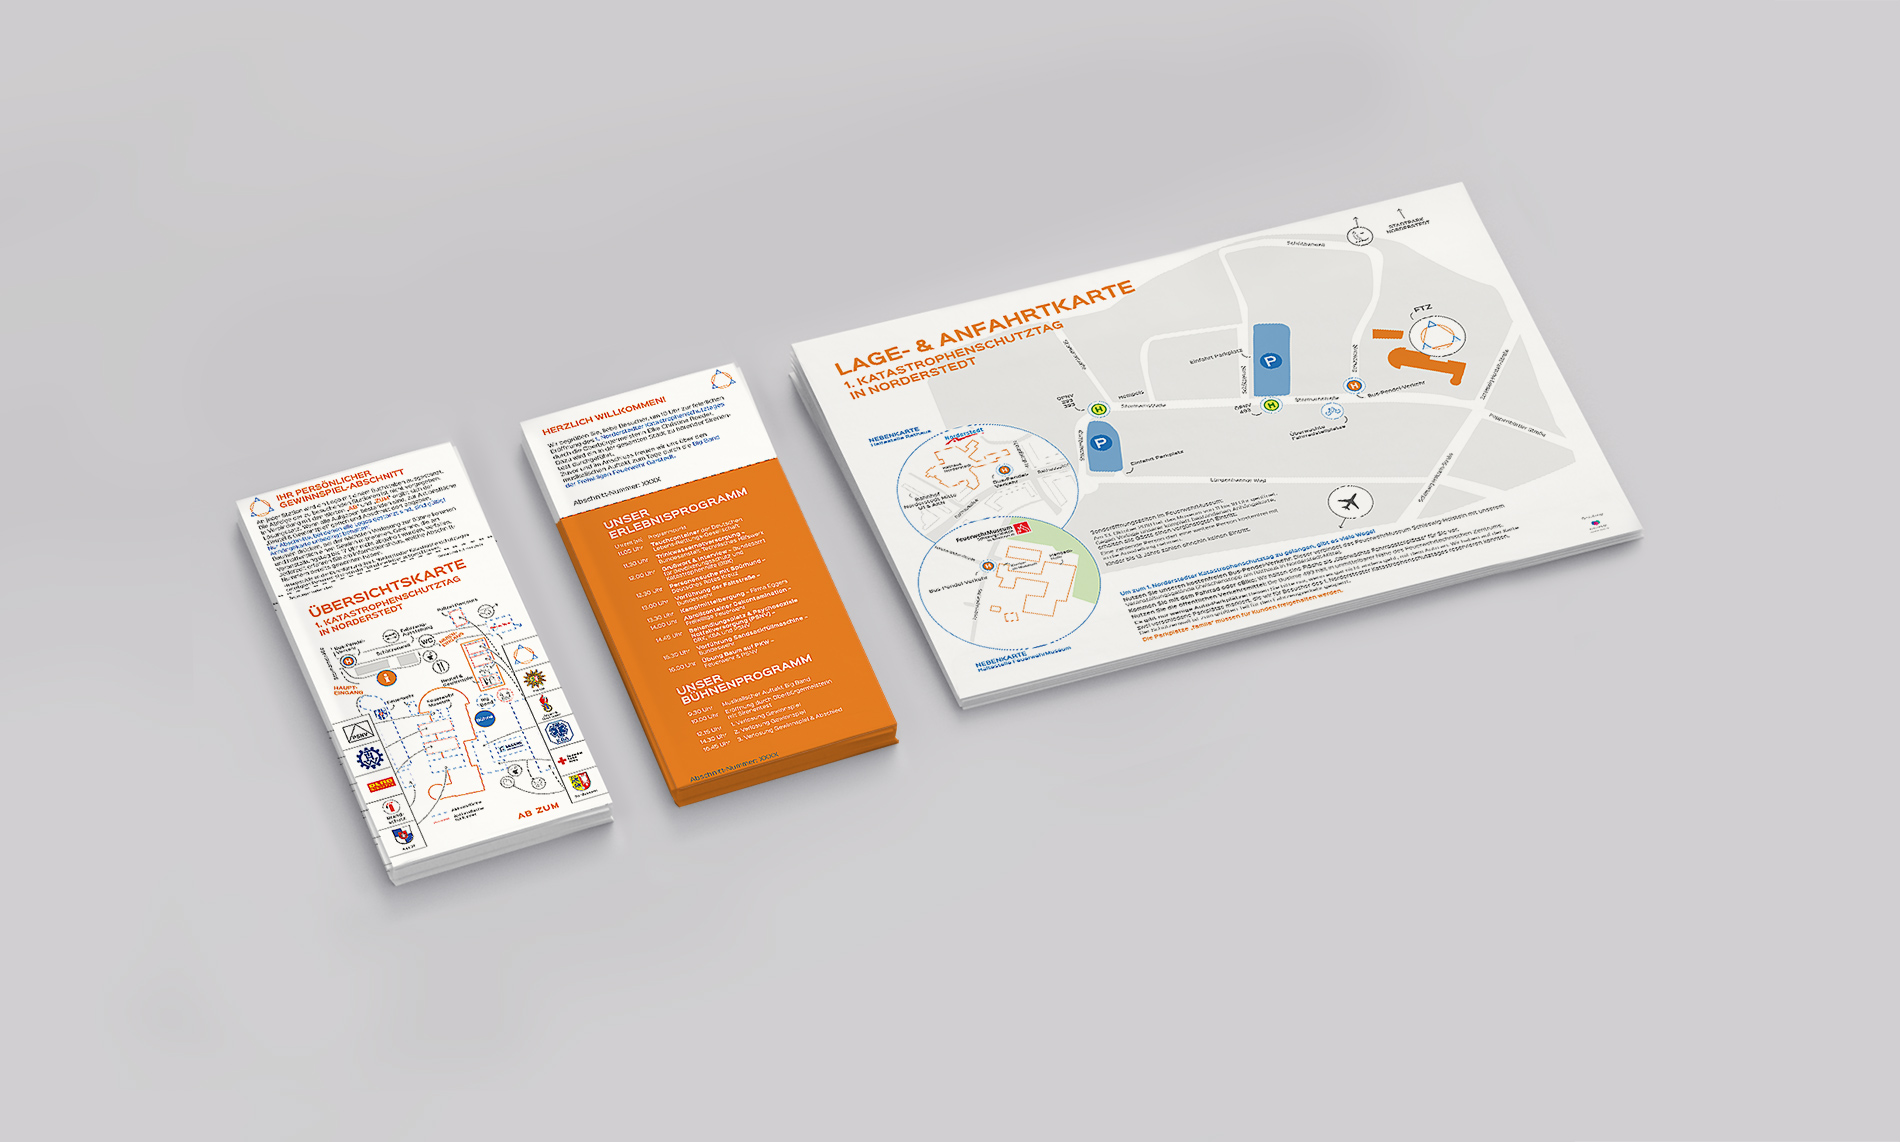 Kuki Design Corporate Design Katastrophenschutz Norderstedt Gestaltung Geschäftspapier, Flyer, Logogestaltung, Farbgebung, Mockup